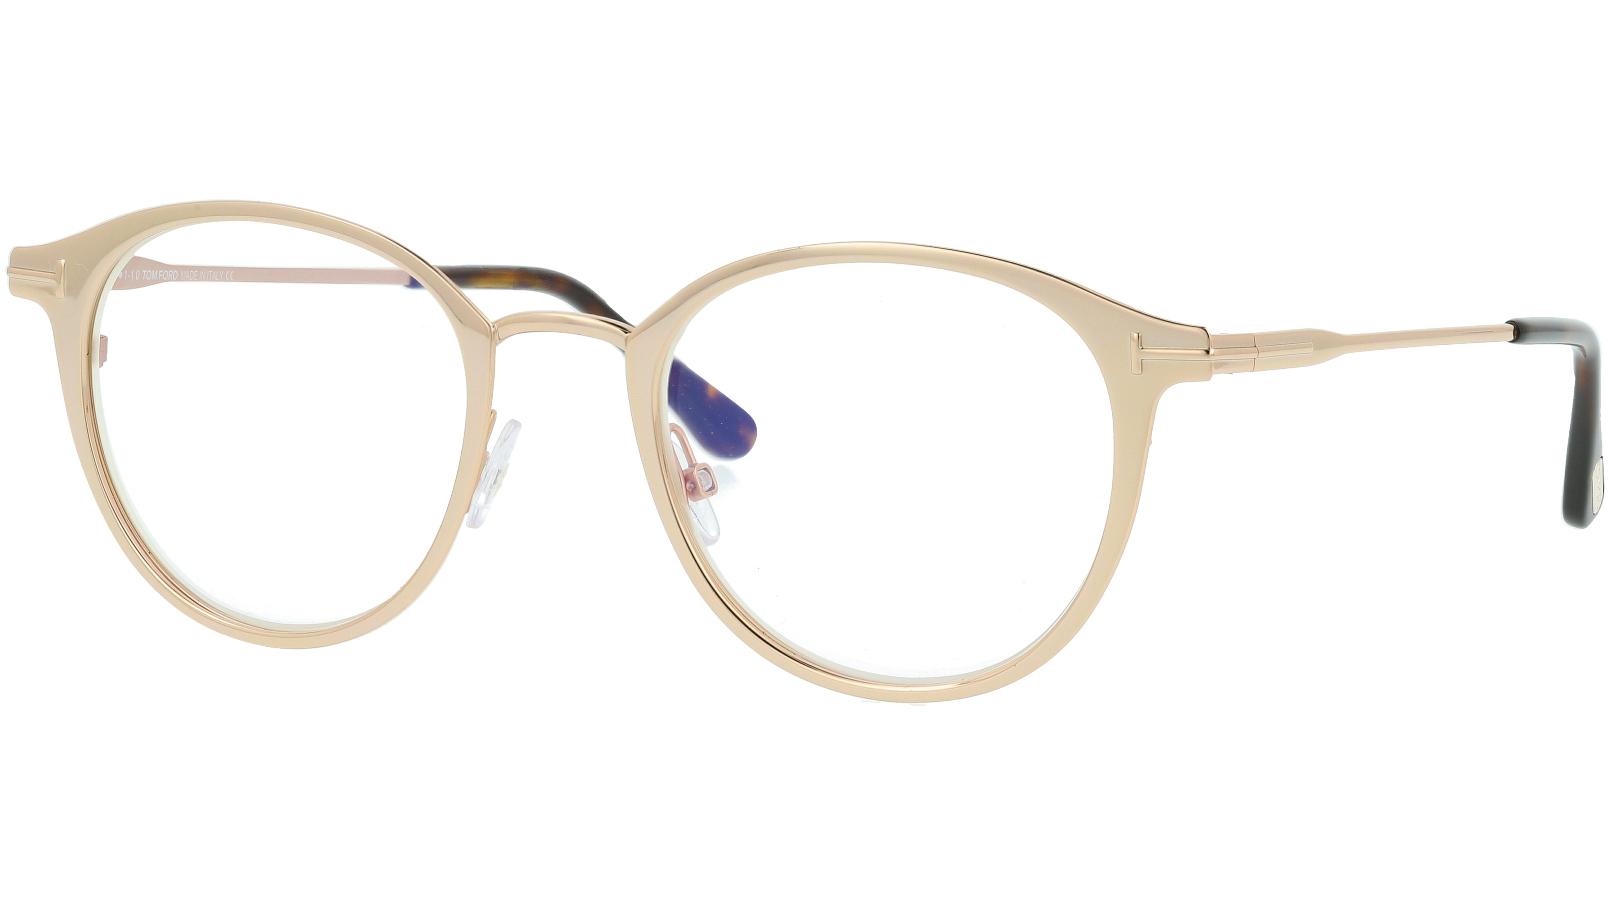 Tom Ford TF5528-B 029 49 Gold Glasses